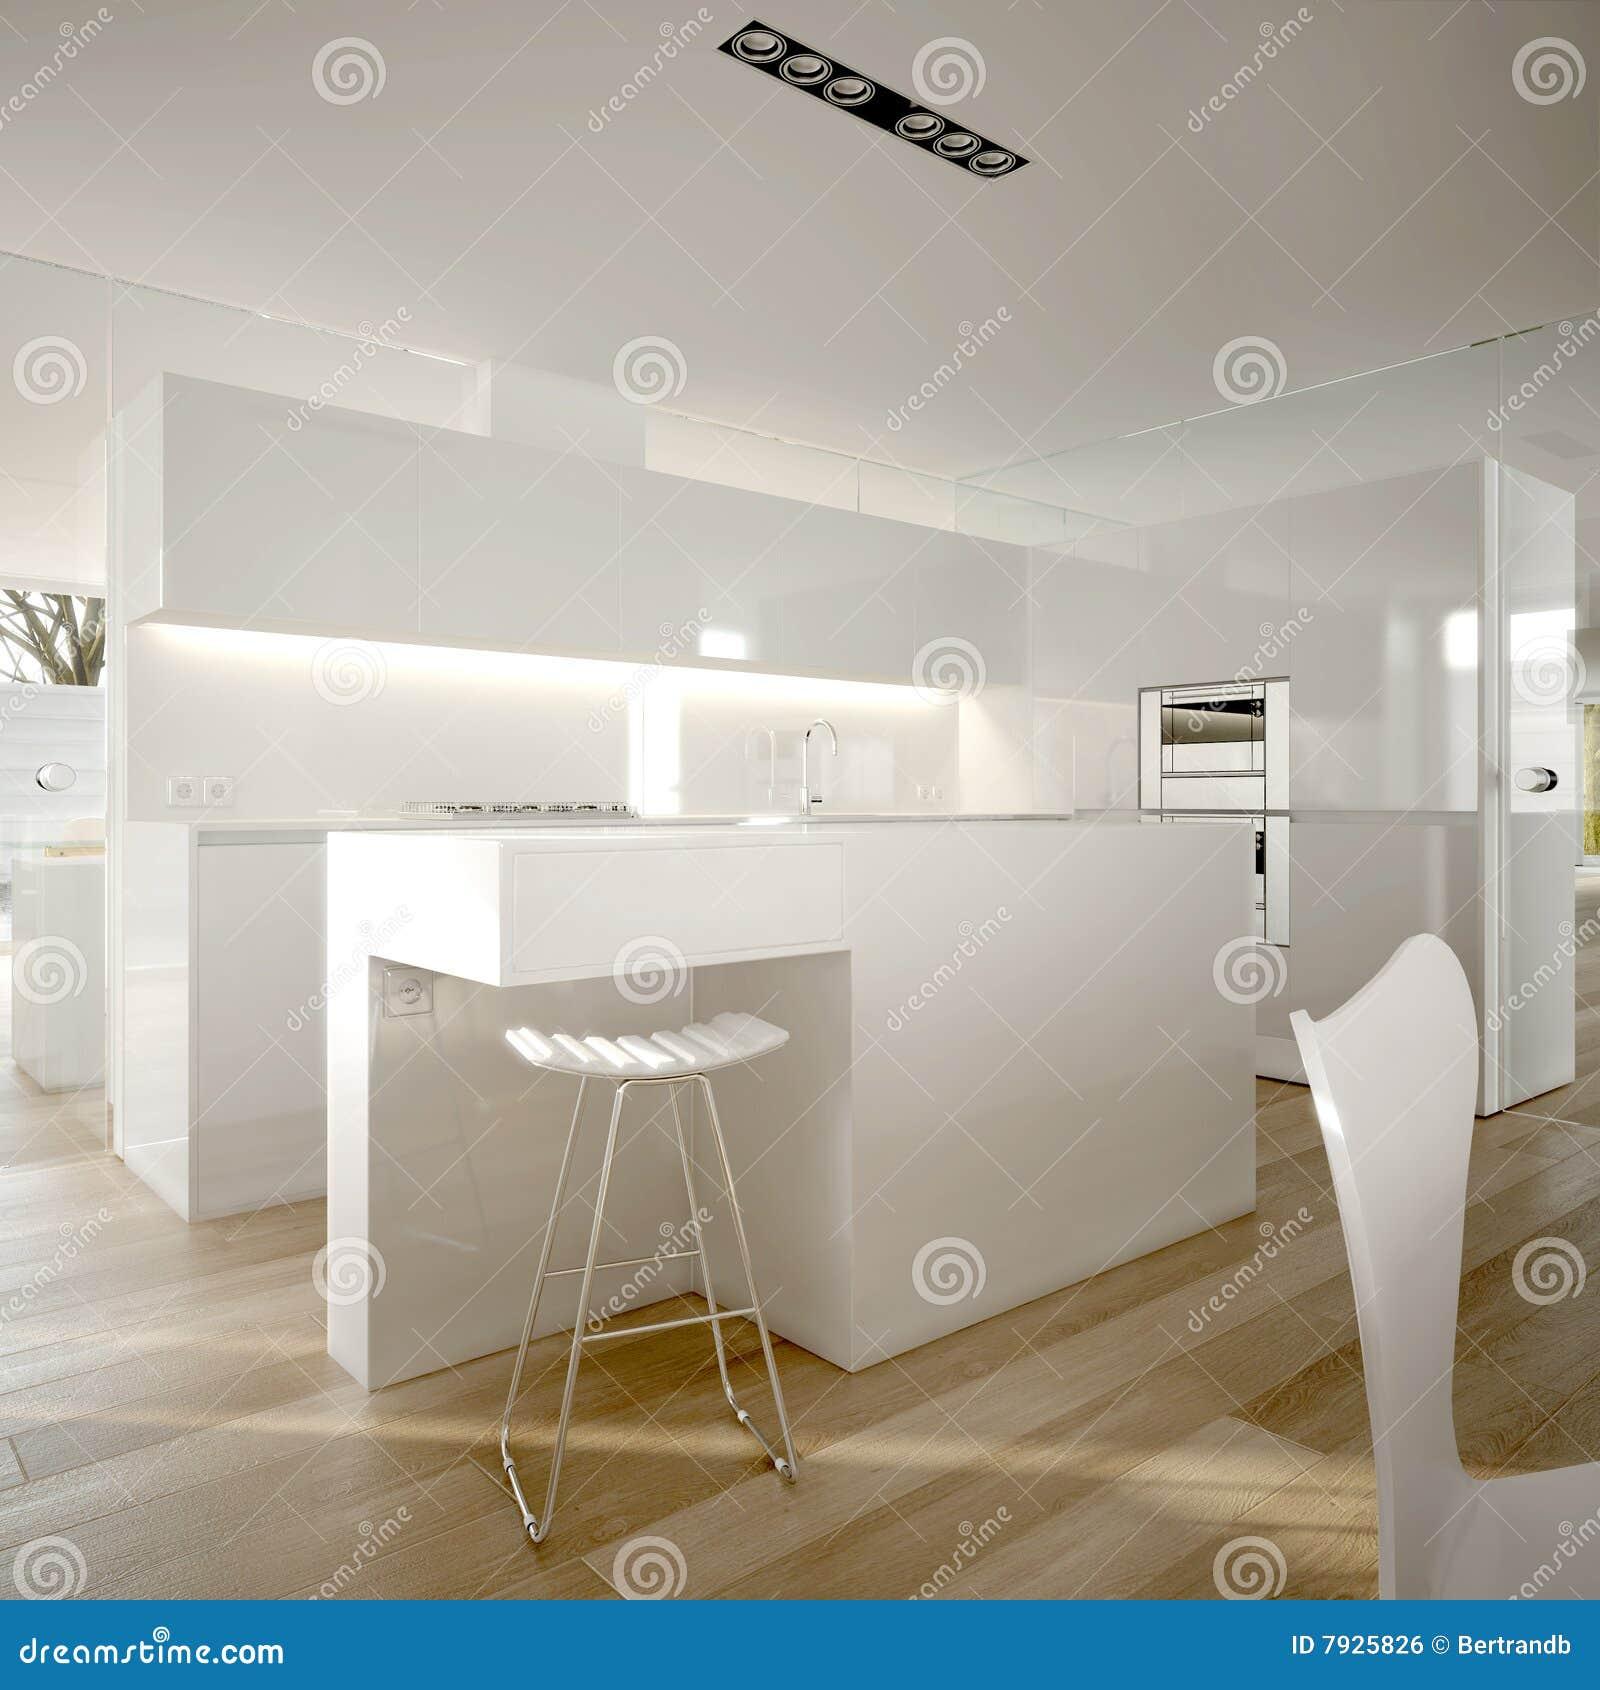 cuisine moderne minimaliste blanche image libre de droits image 7925826. Black Bedroom Furniture Sets. Home Design Ideas